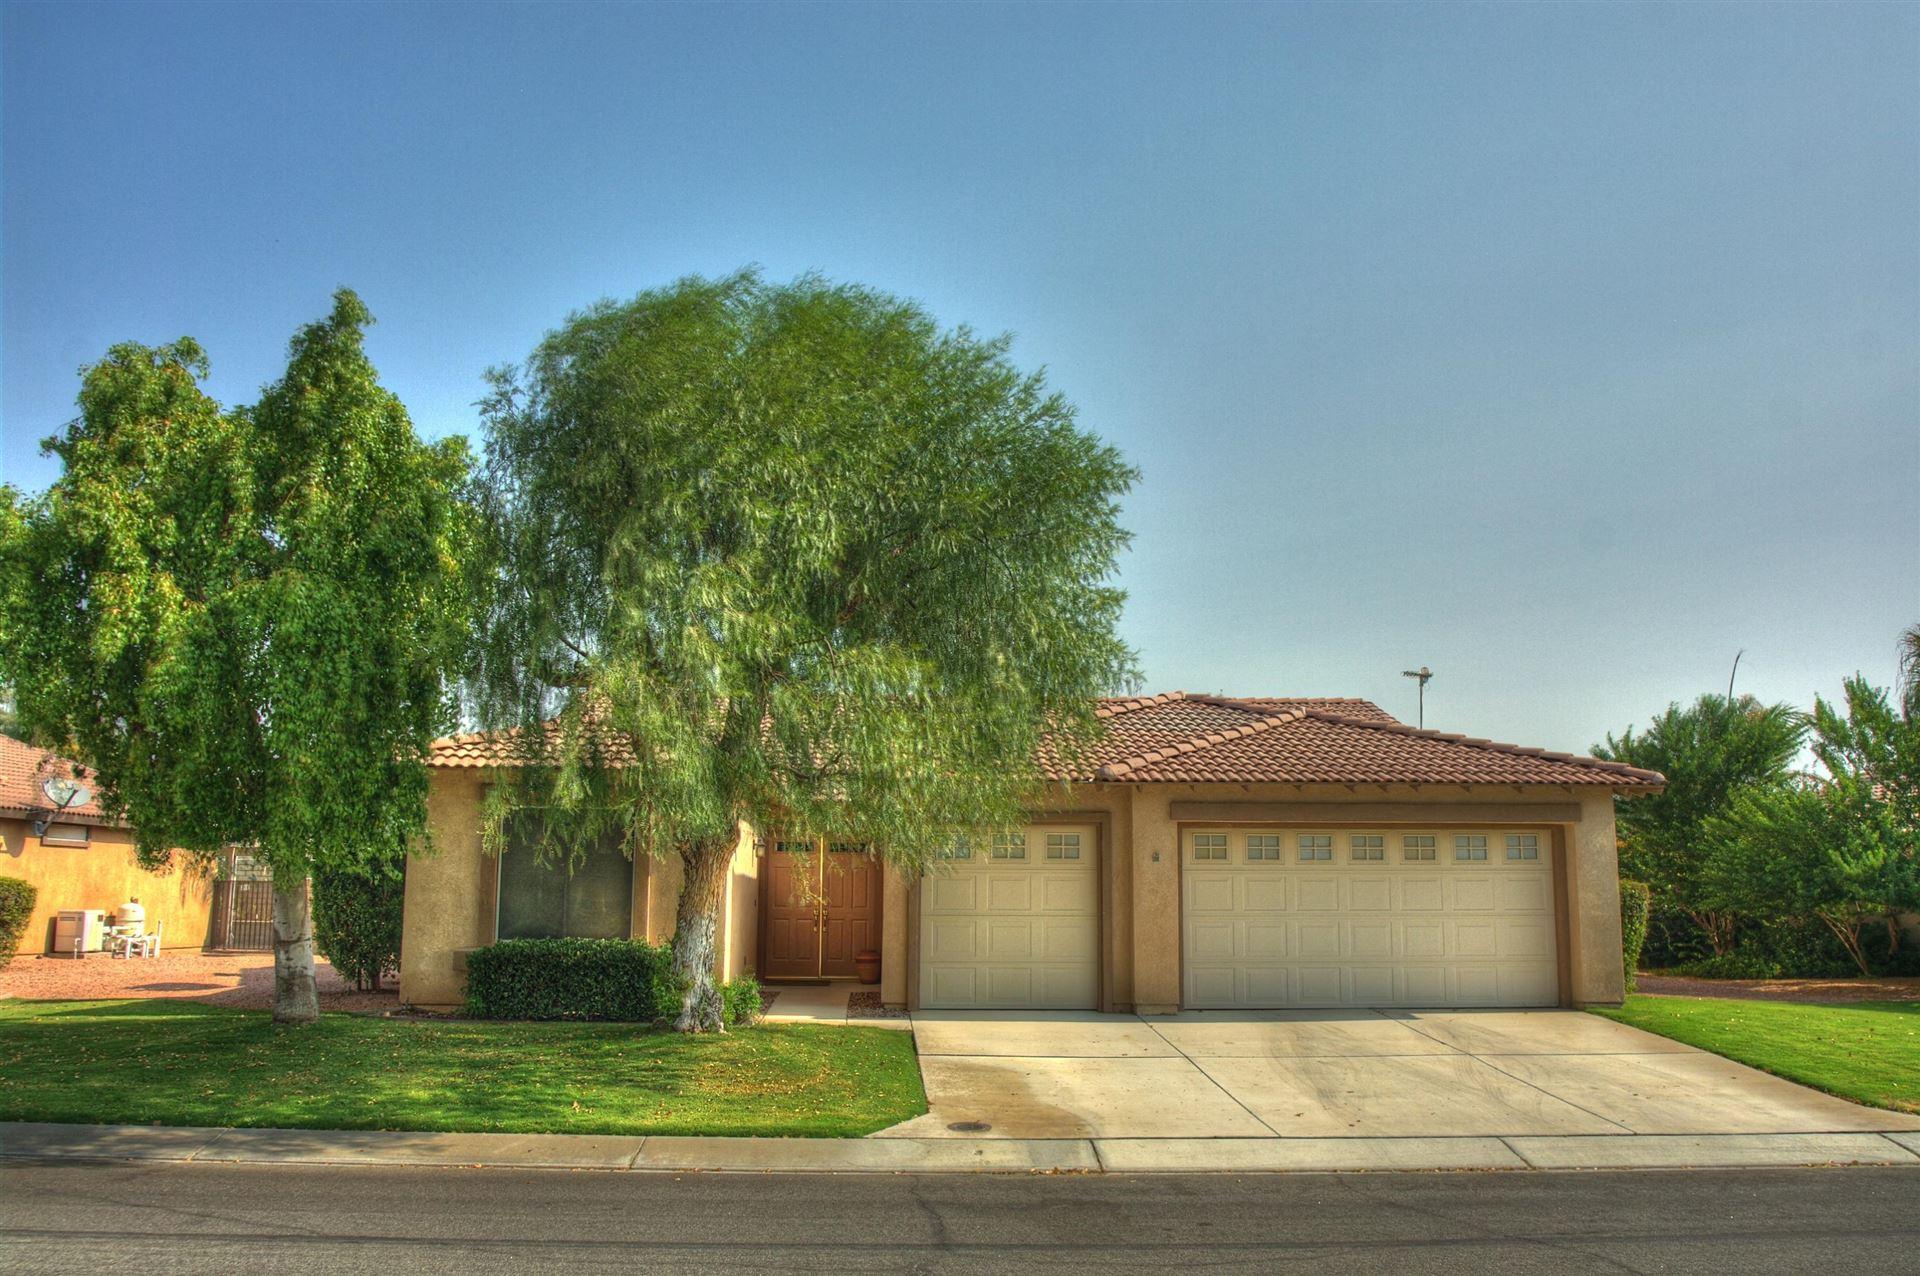 82520 Lincoln Drive, Indio, CA 92201 - MLS#: 219049747